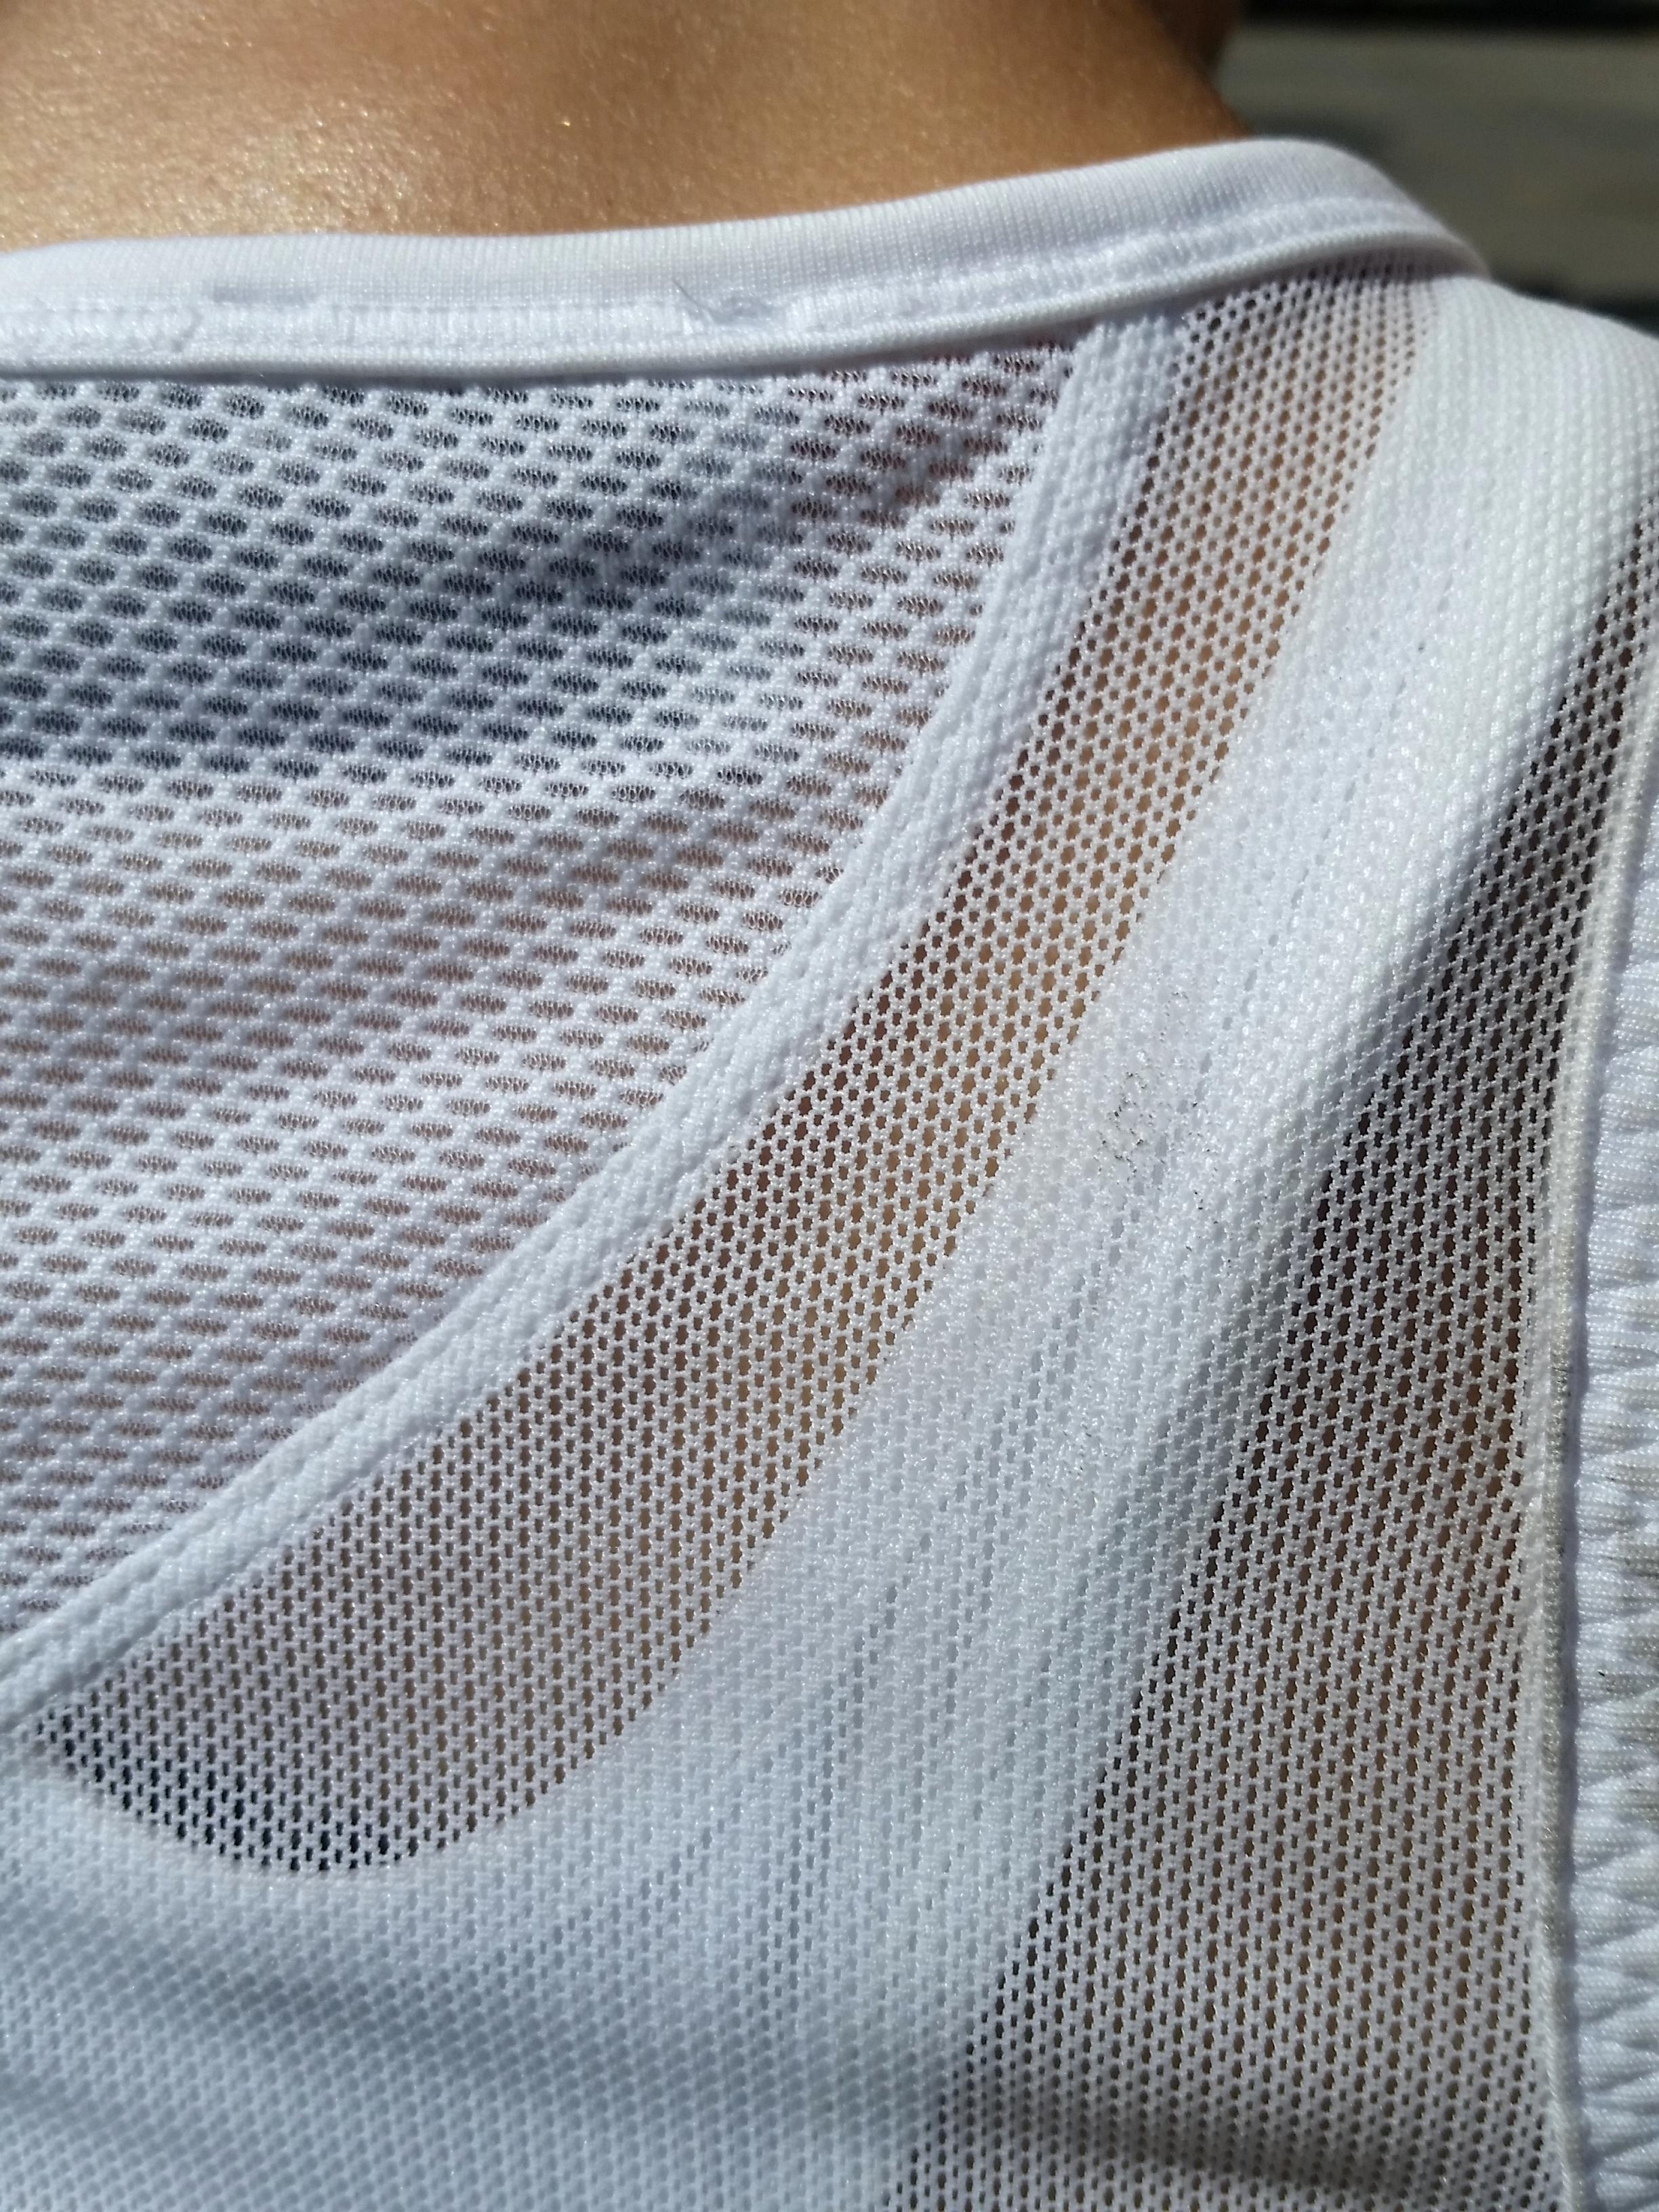 stella mccartney adidas tennis dress